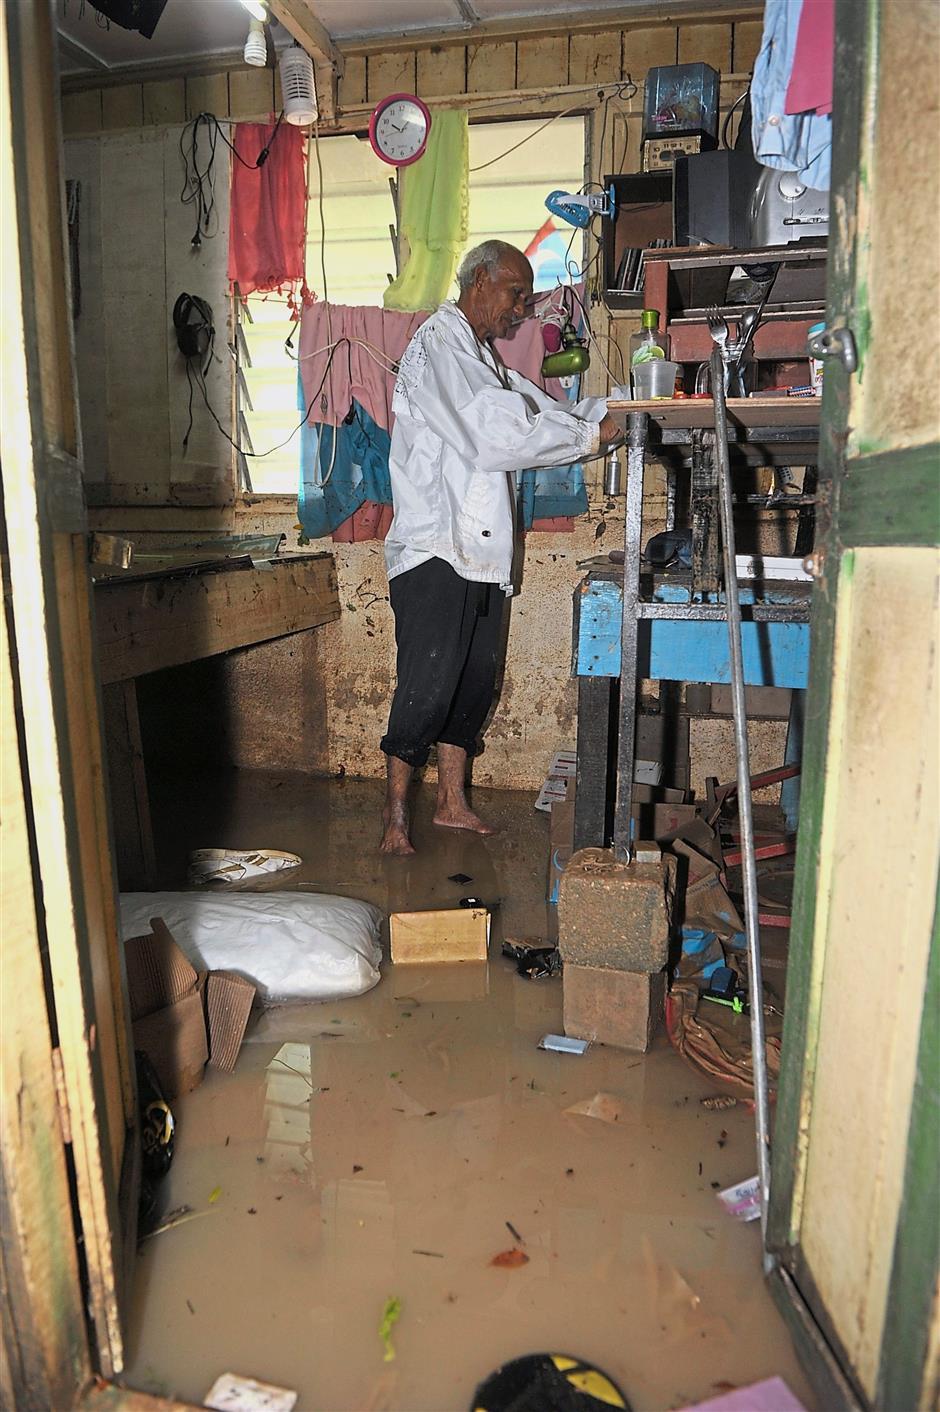 Samat Wan Chik, 73, inspecting some of the furniture in his house at Jalan Rawang off Jalan P. Ramlee after the flash flood.